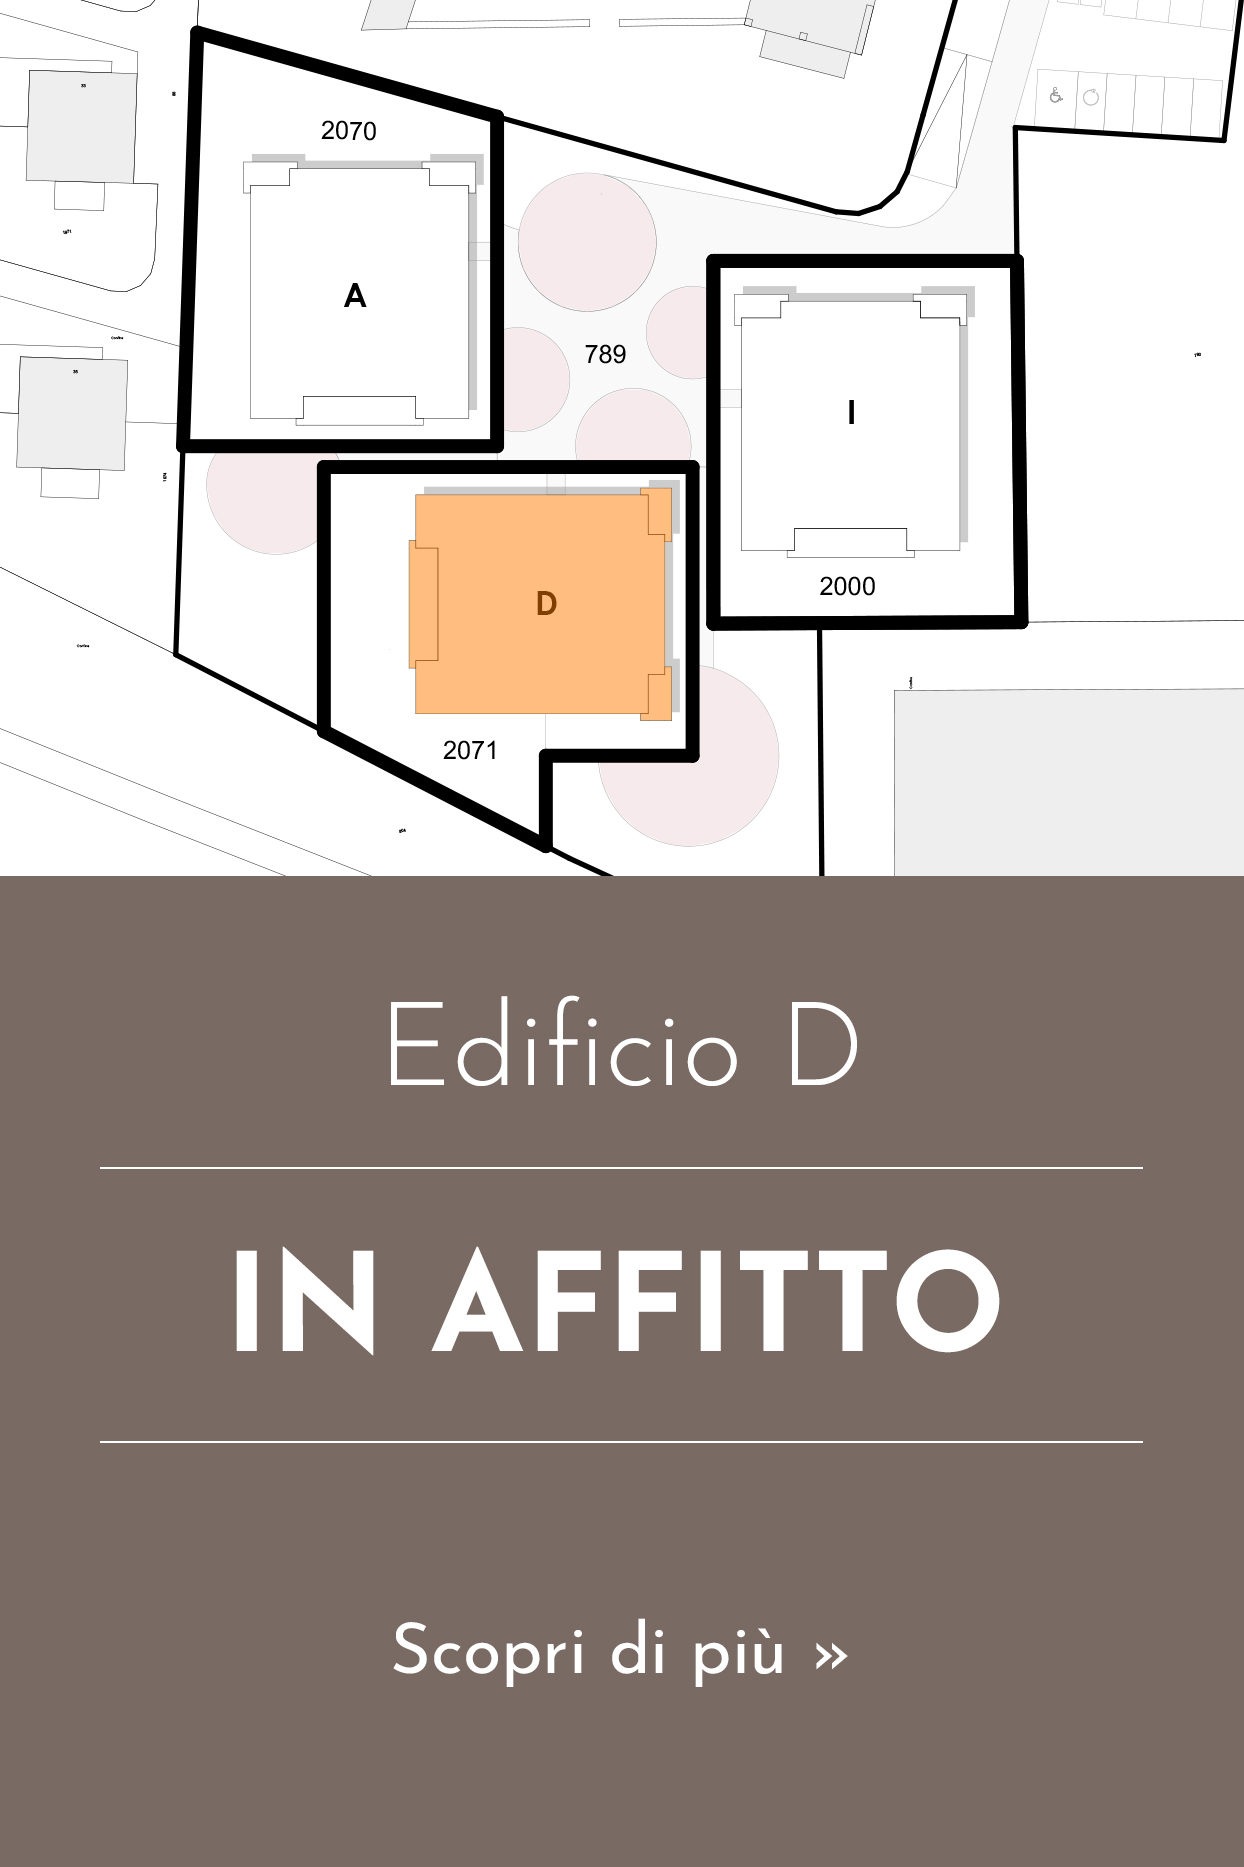 IDA_Blocco_Edificio_D.jpg